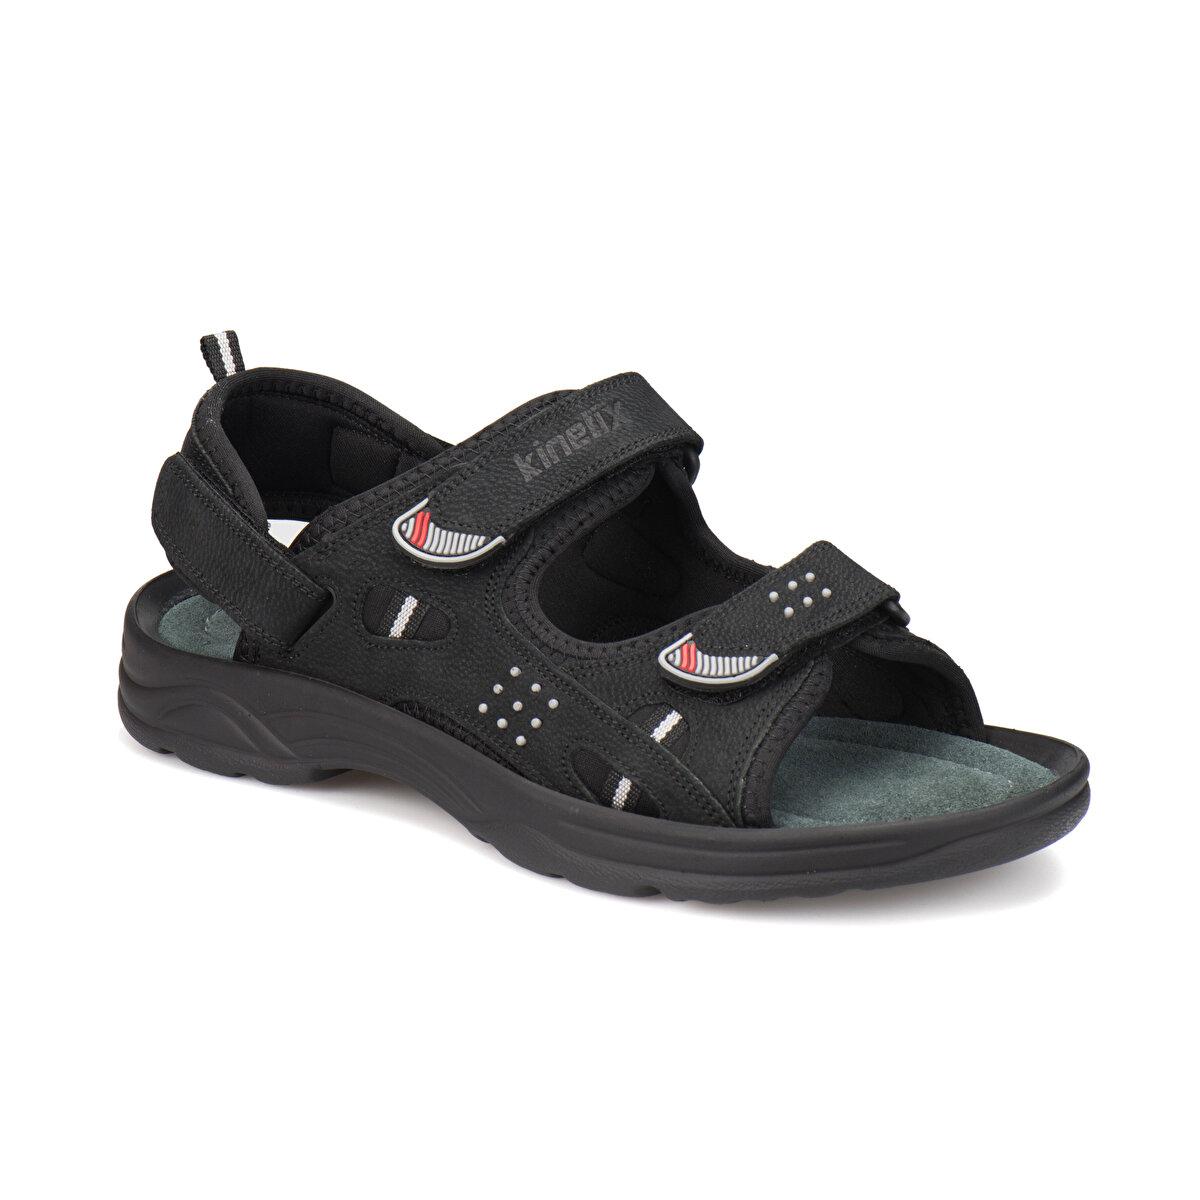 SIYAH Erkek Sandalet LUTHER